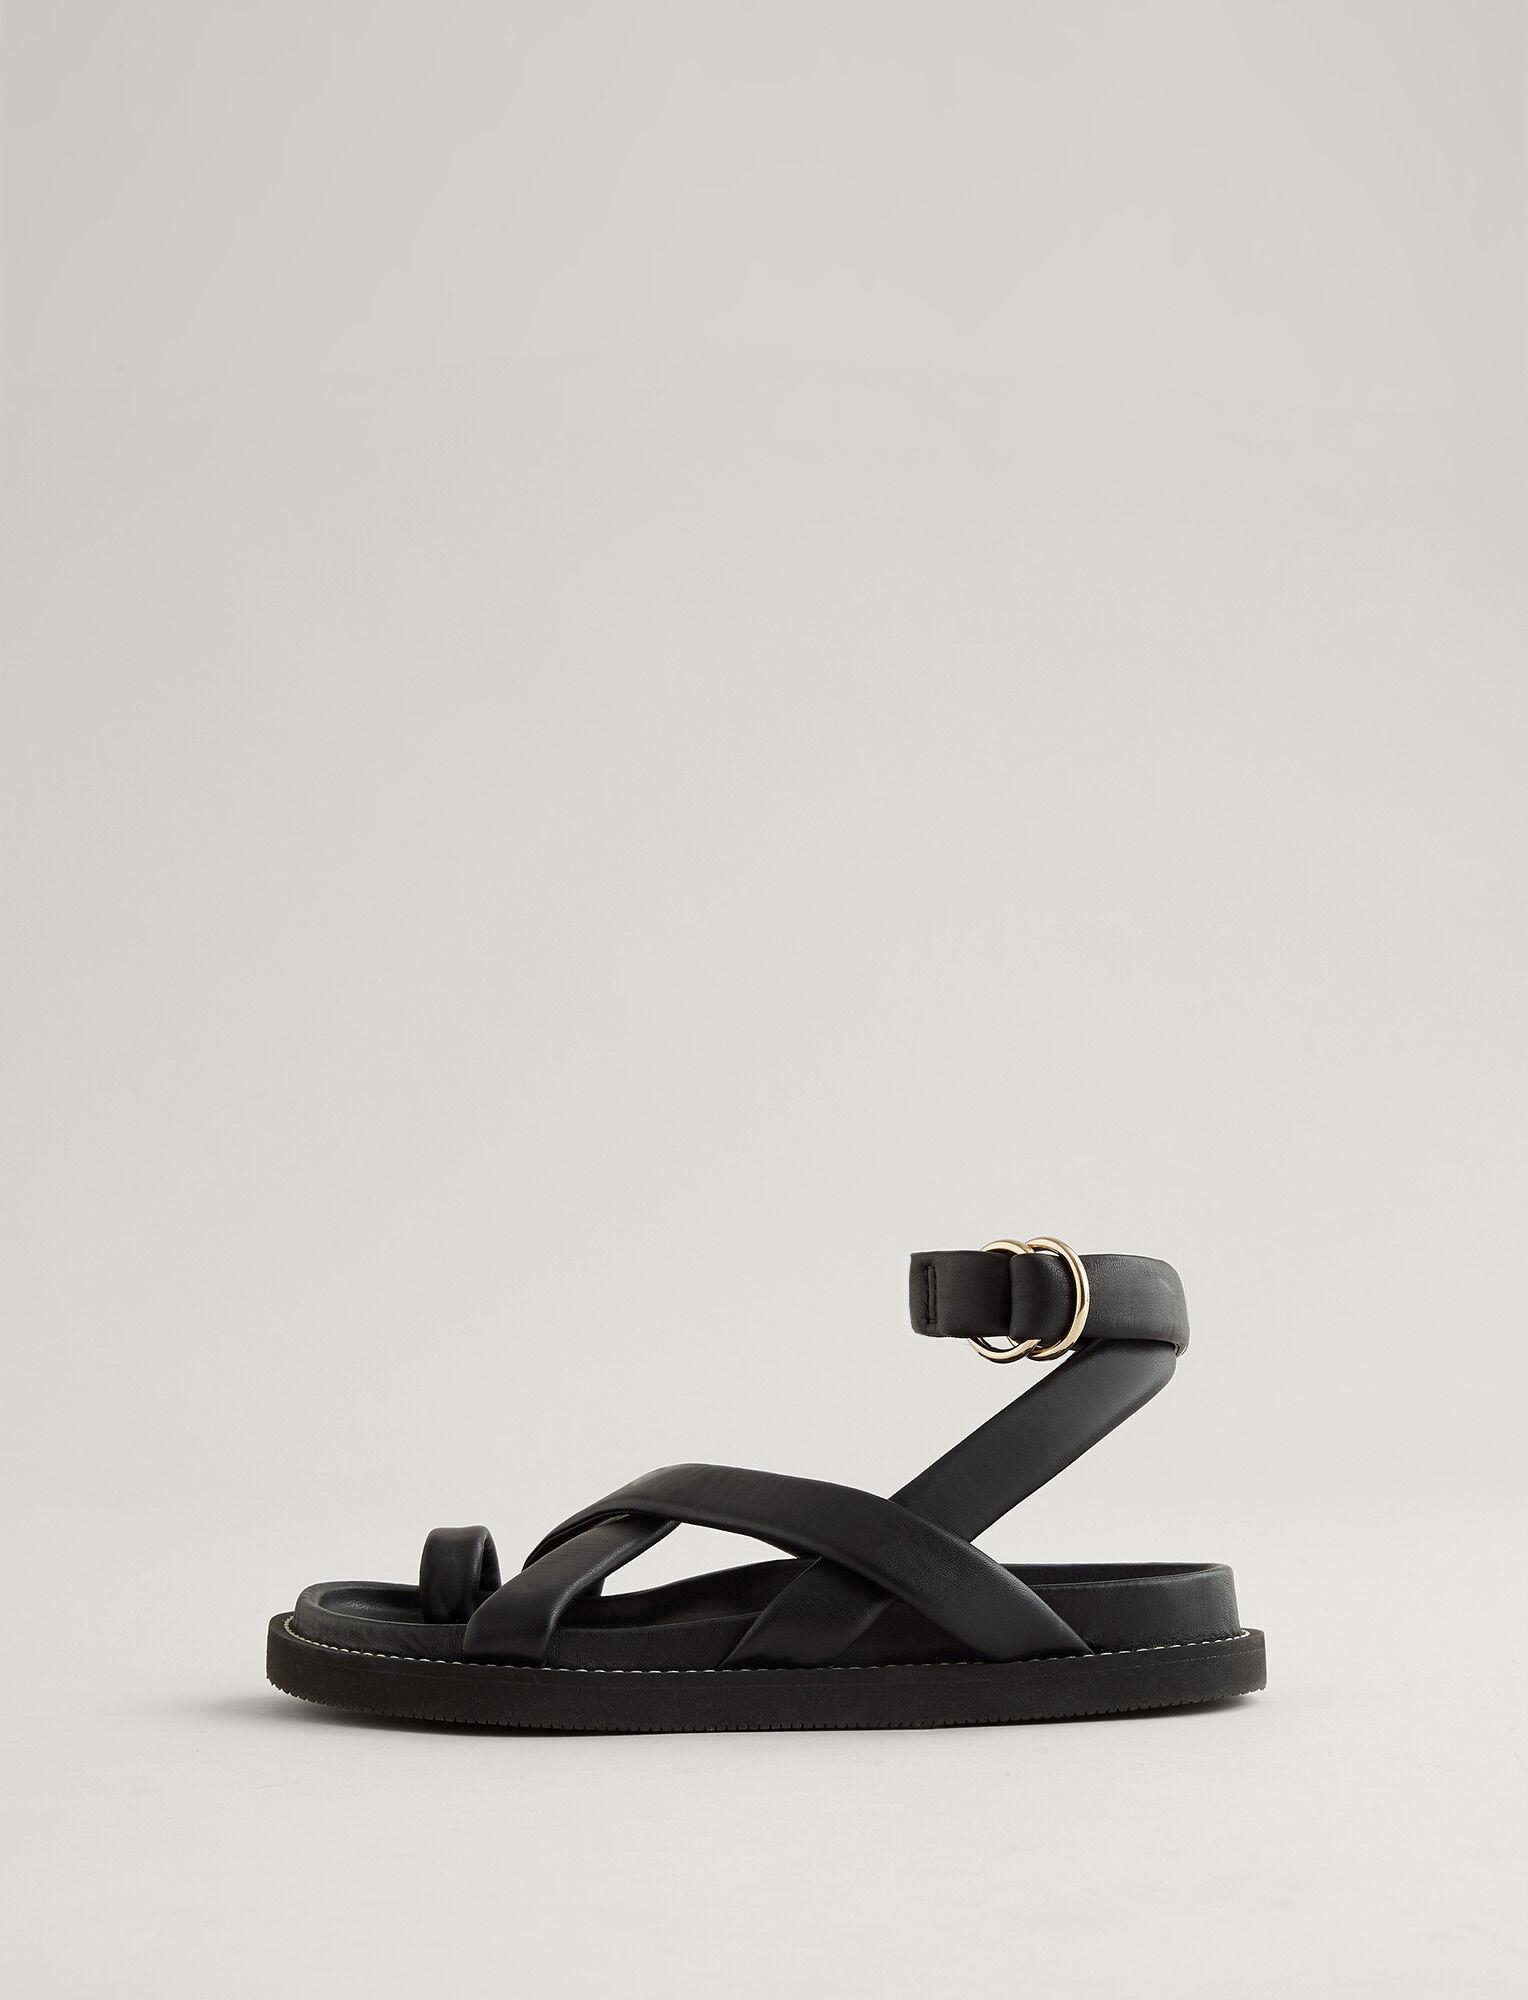 Designer Flats for Women   Flat Shoes